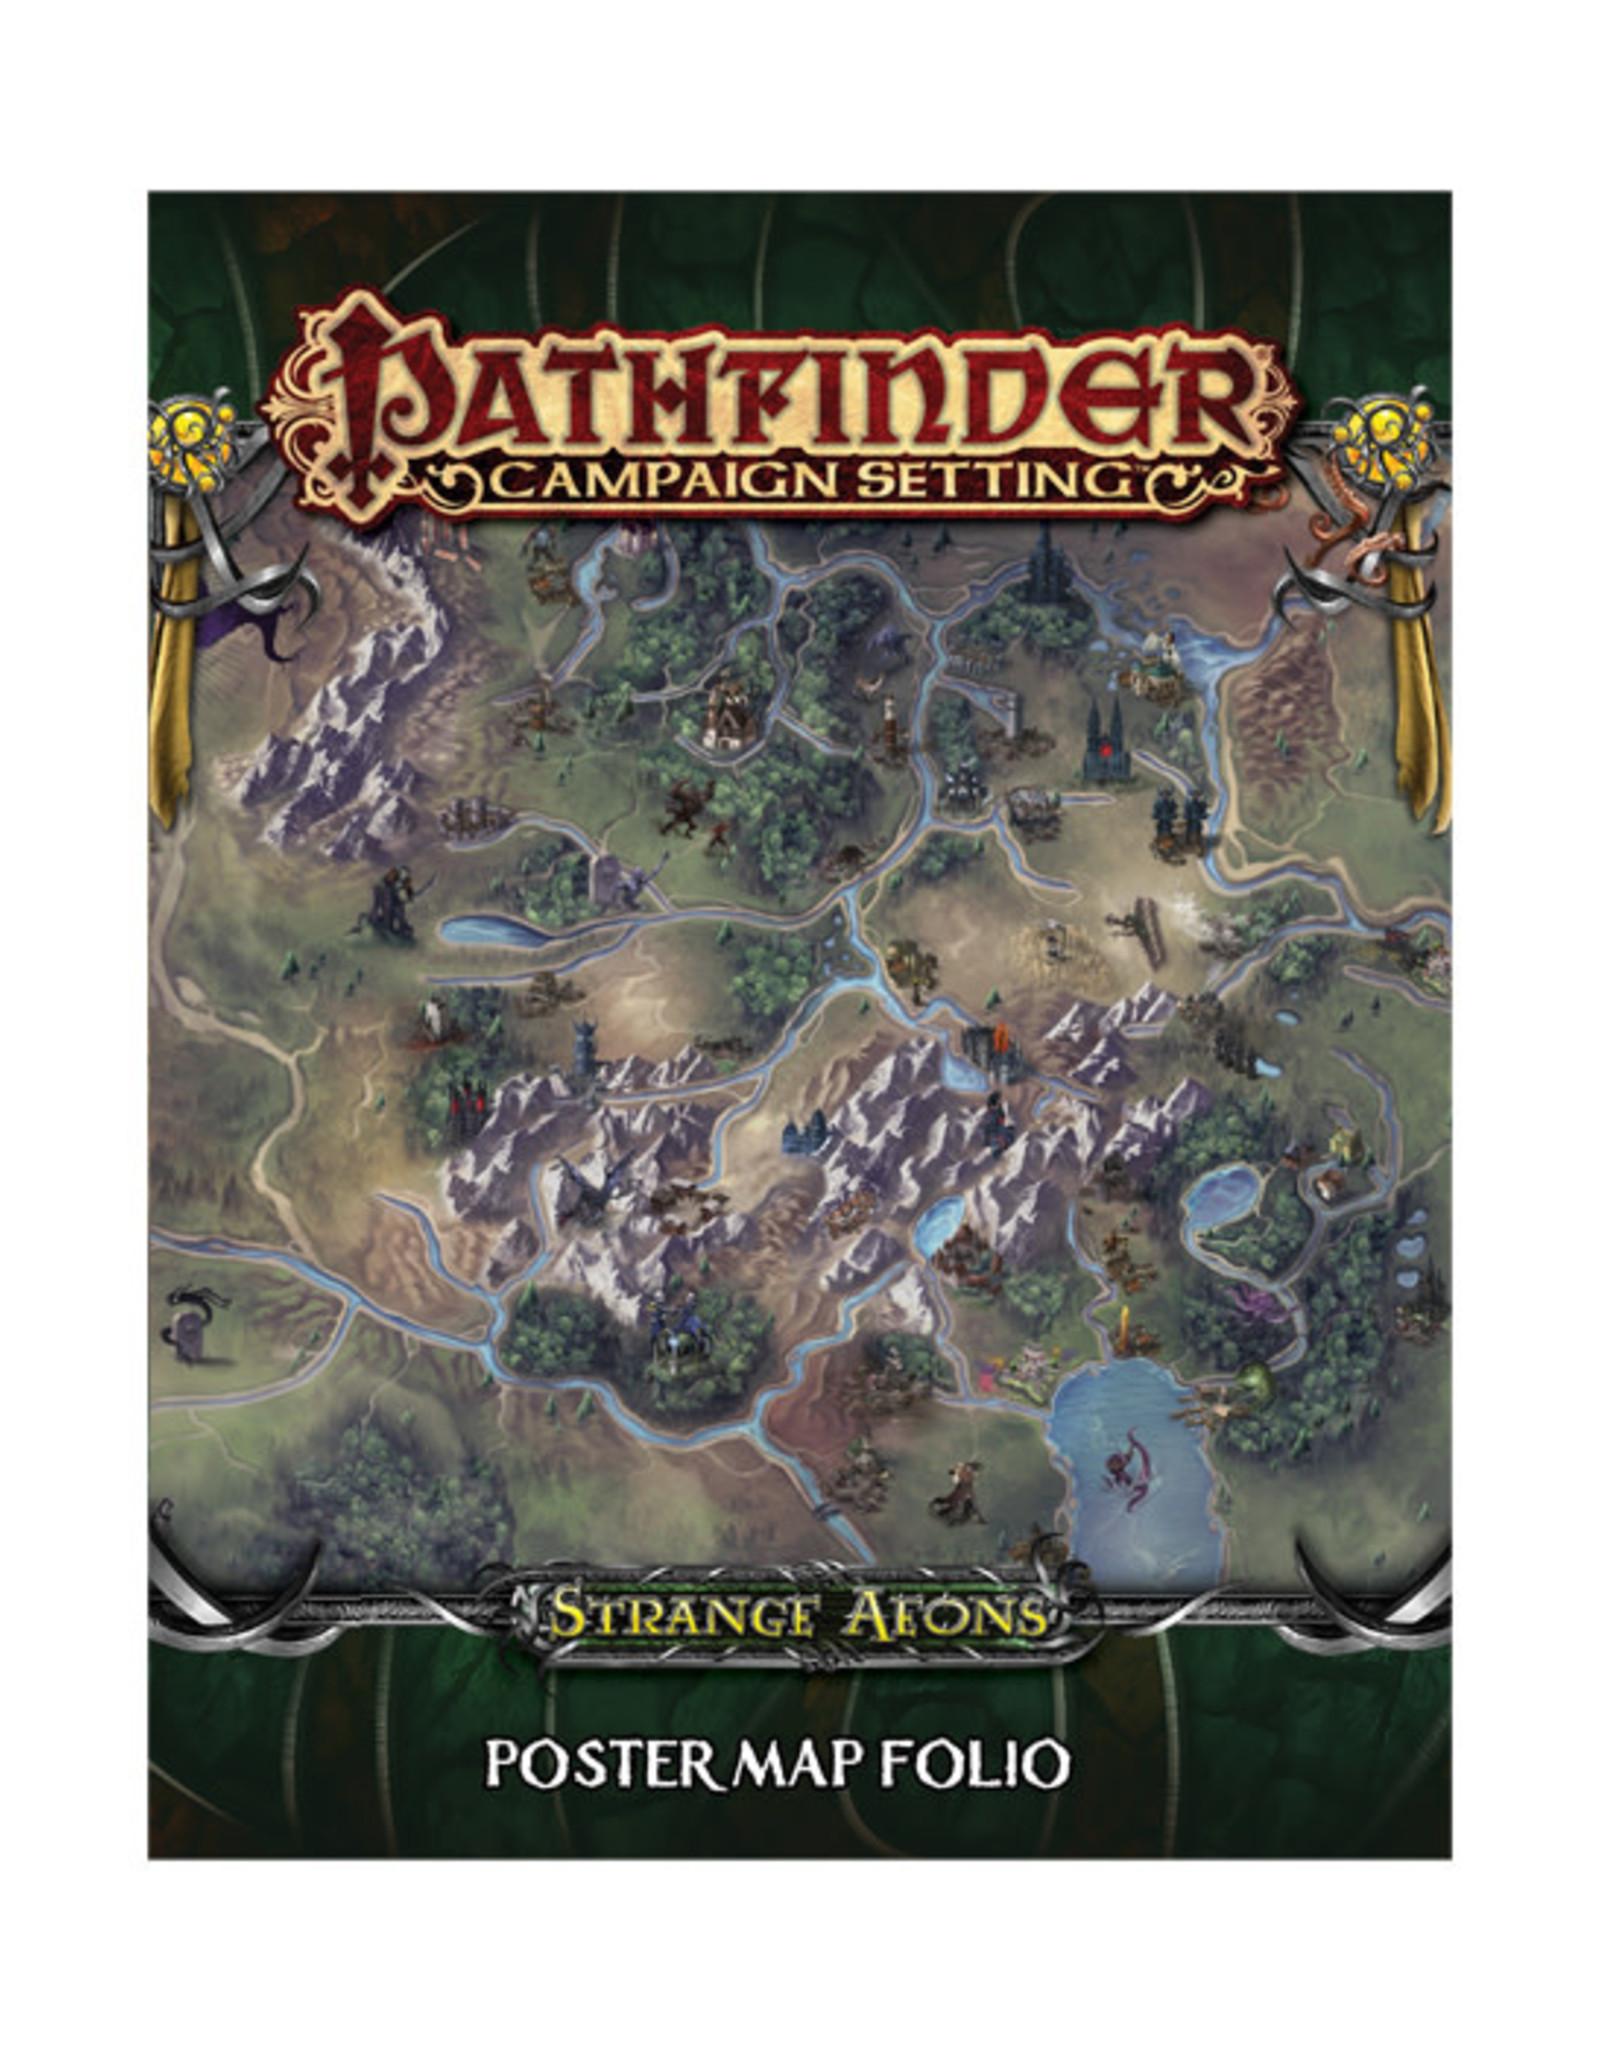 Pathfinder Pathfinder: Campaign Setting - Strange Aeons - Poster Map Folio